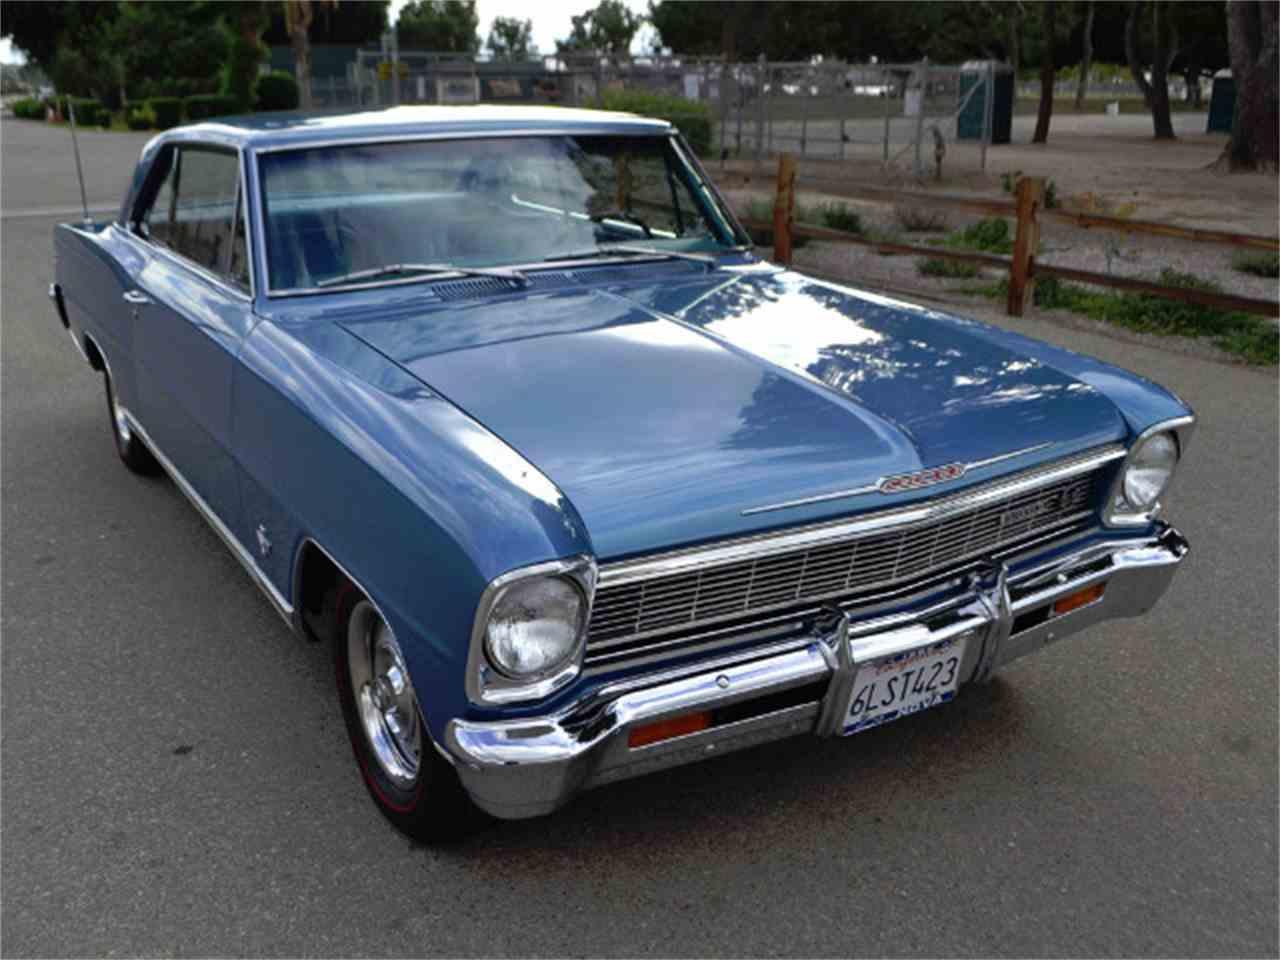 1966 Chevy Nova 2 For Sale Find New Ii Sedan Chevrolet Classiccarscom